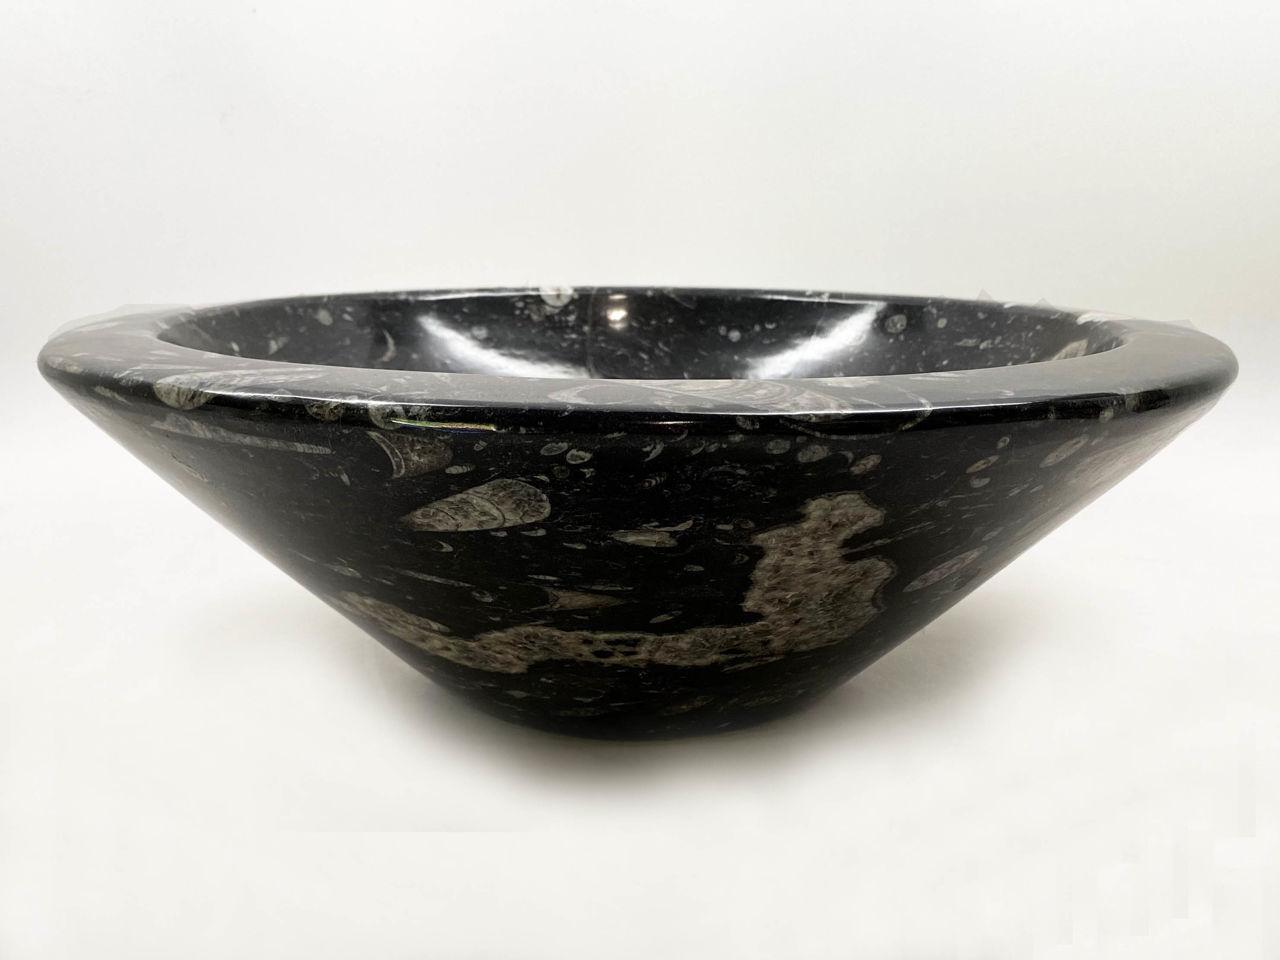 Picture of Genese Fossil Vessel in Noir (156)